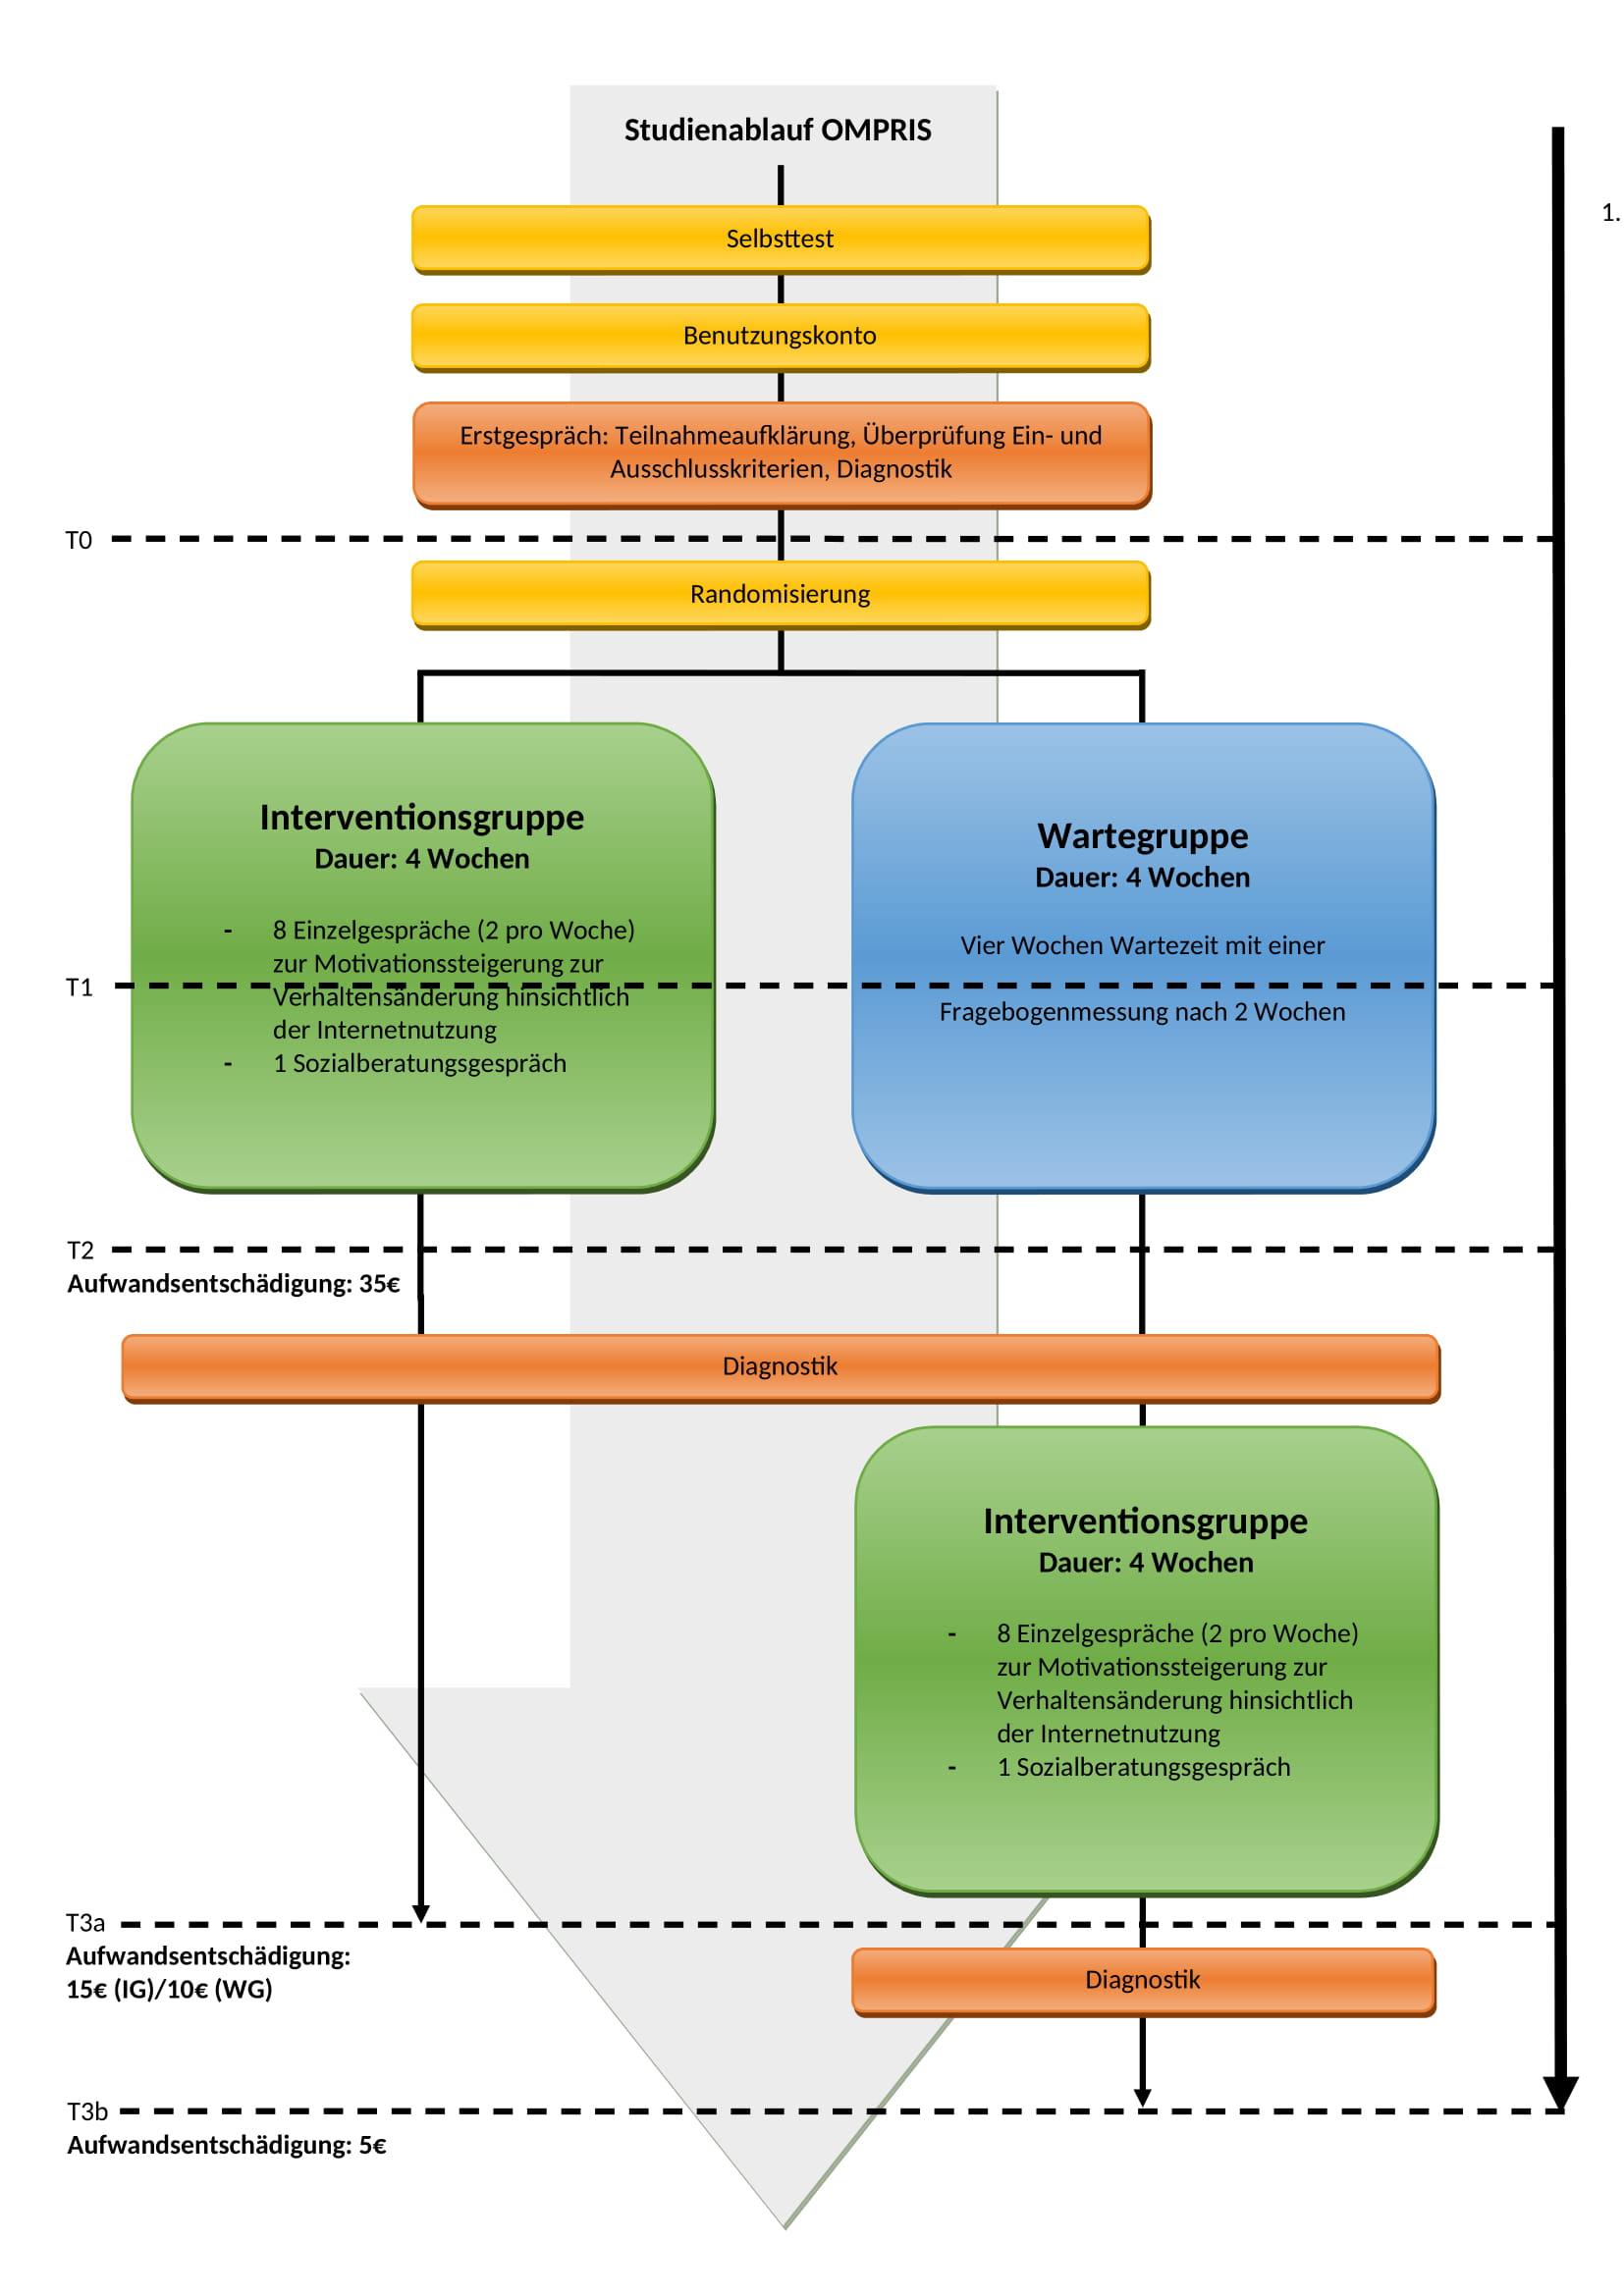 OMPRIS Studiendesign Version 9